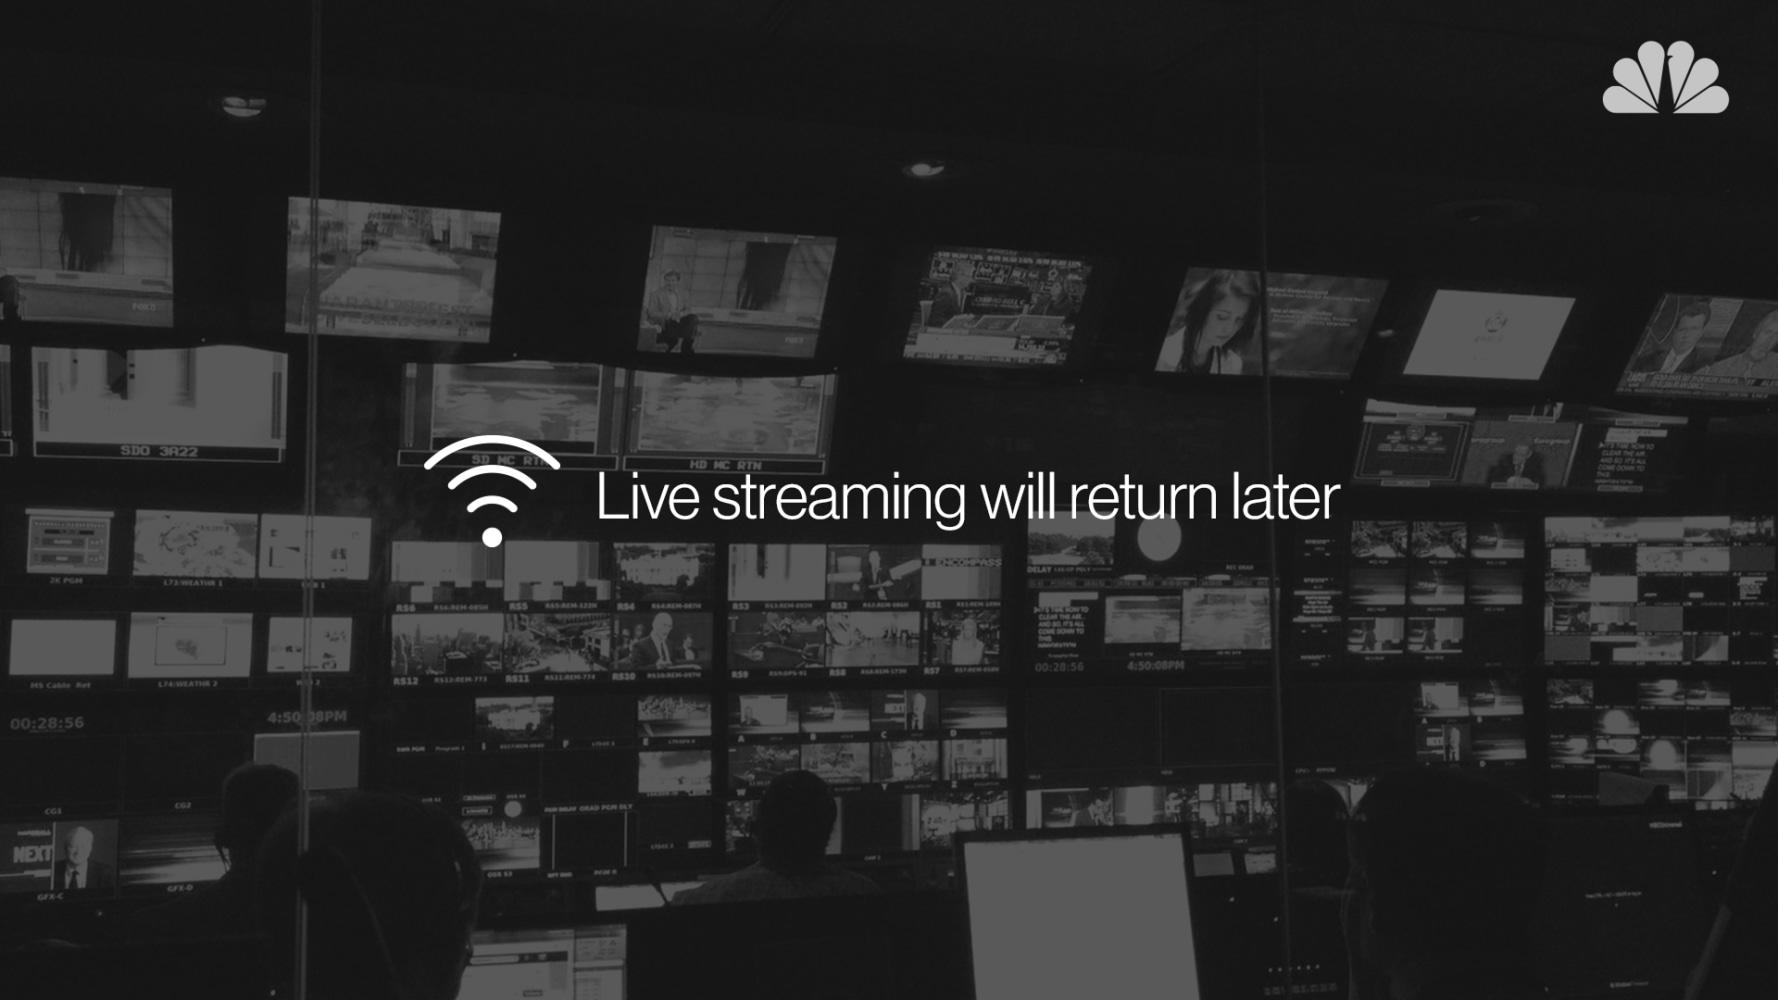 Breaking News Live Video - NBC News